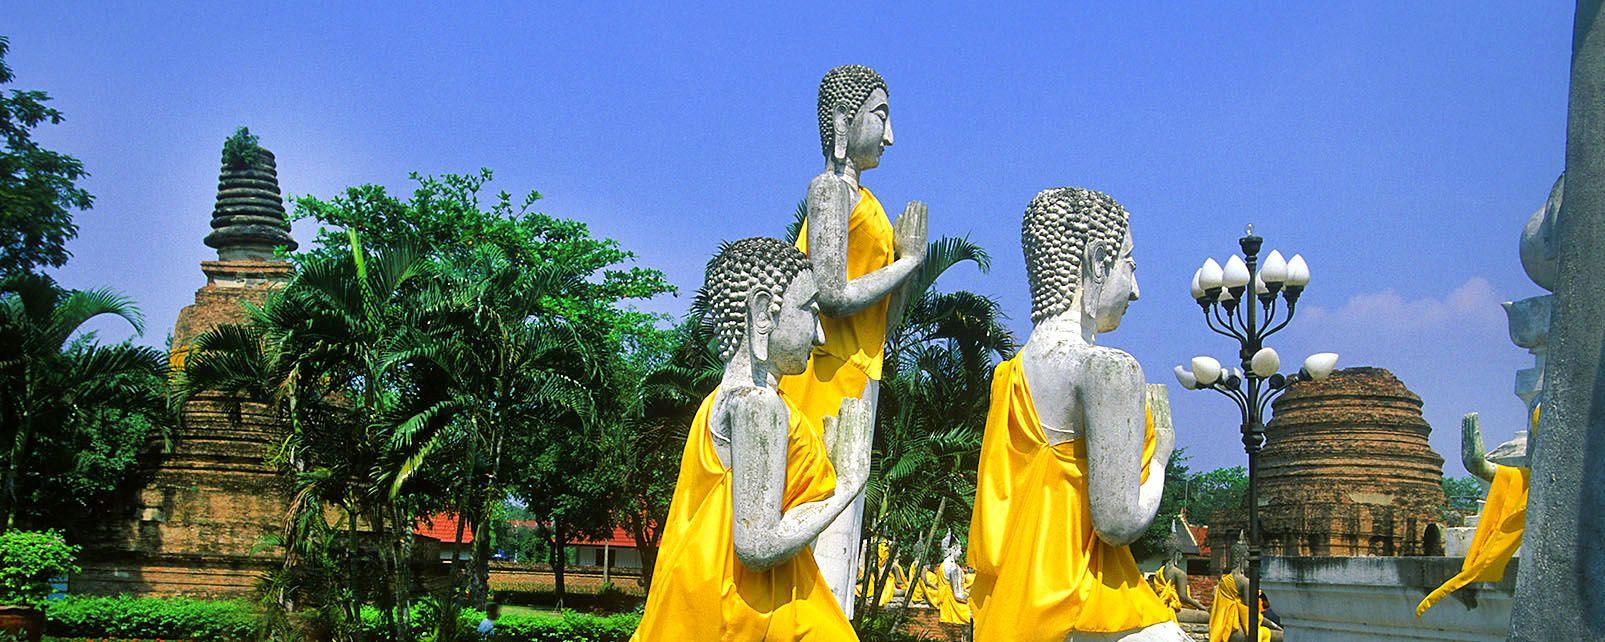 Ayutthaya, Los monumentos, Ayutthaya, Tailandia